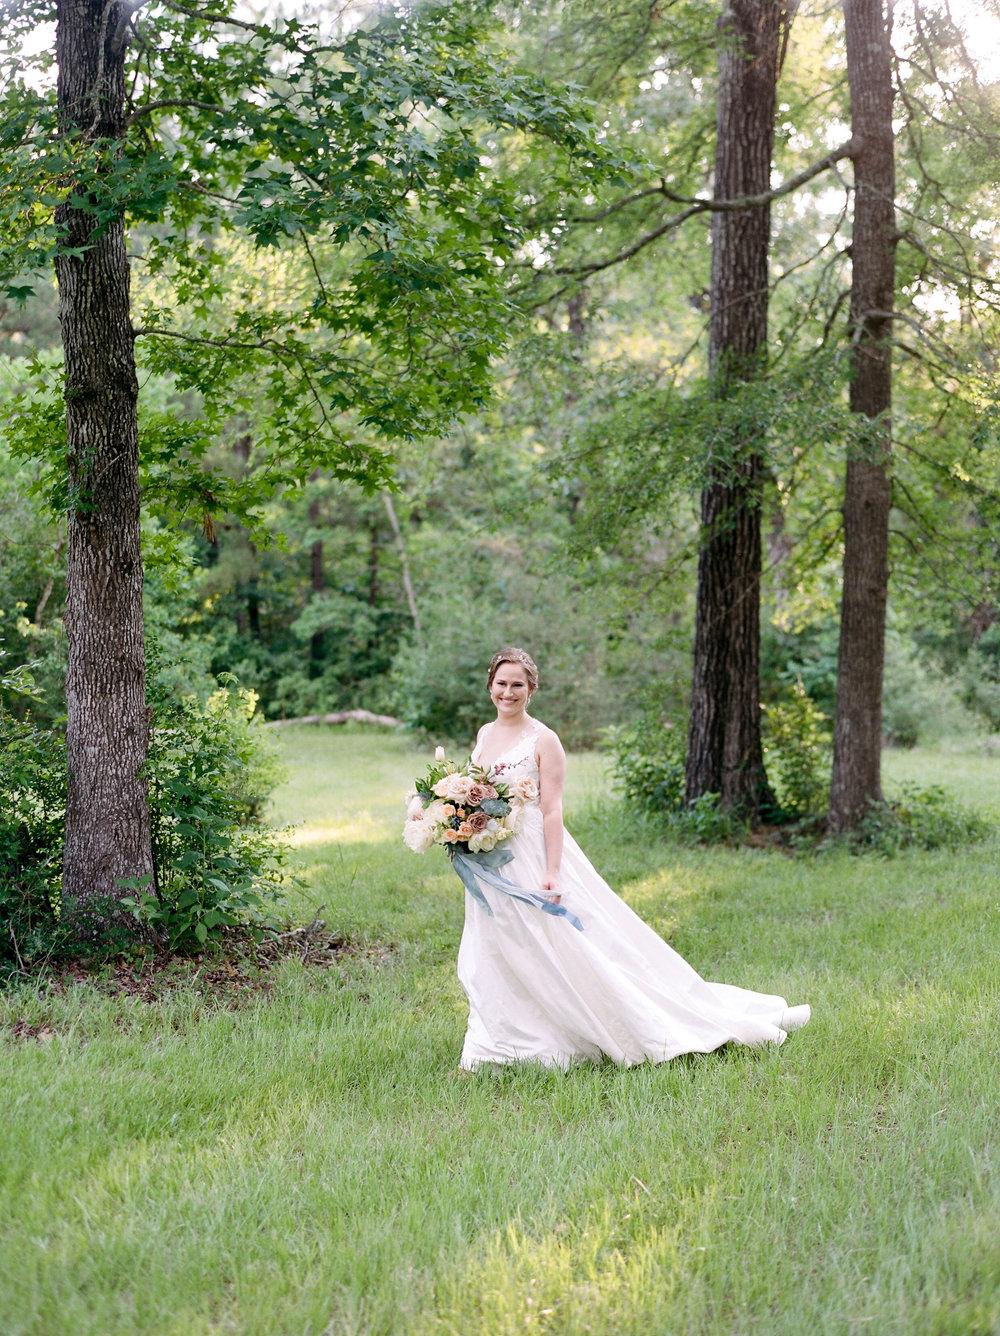 Houston-Fine-Art-Film-Destination-Wedding-Photographer-Top-Best-Luxury-Josh-Dana-Fernandez-Photographer-Austin-Texas-12.jpg